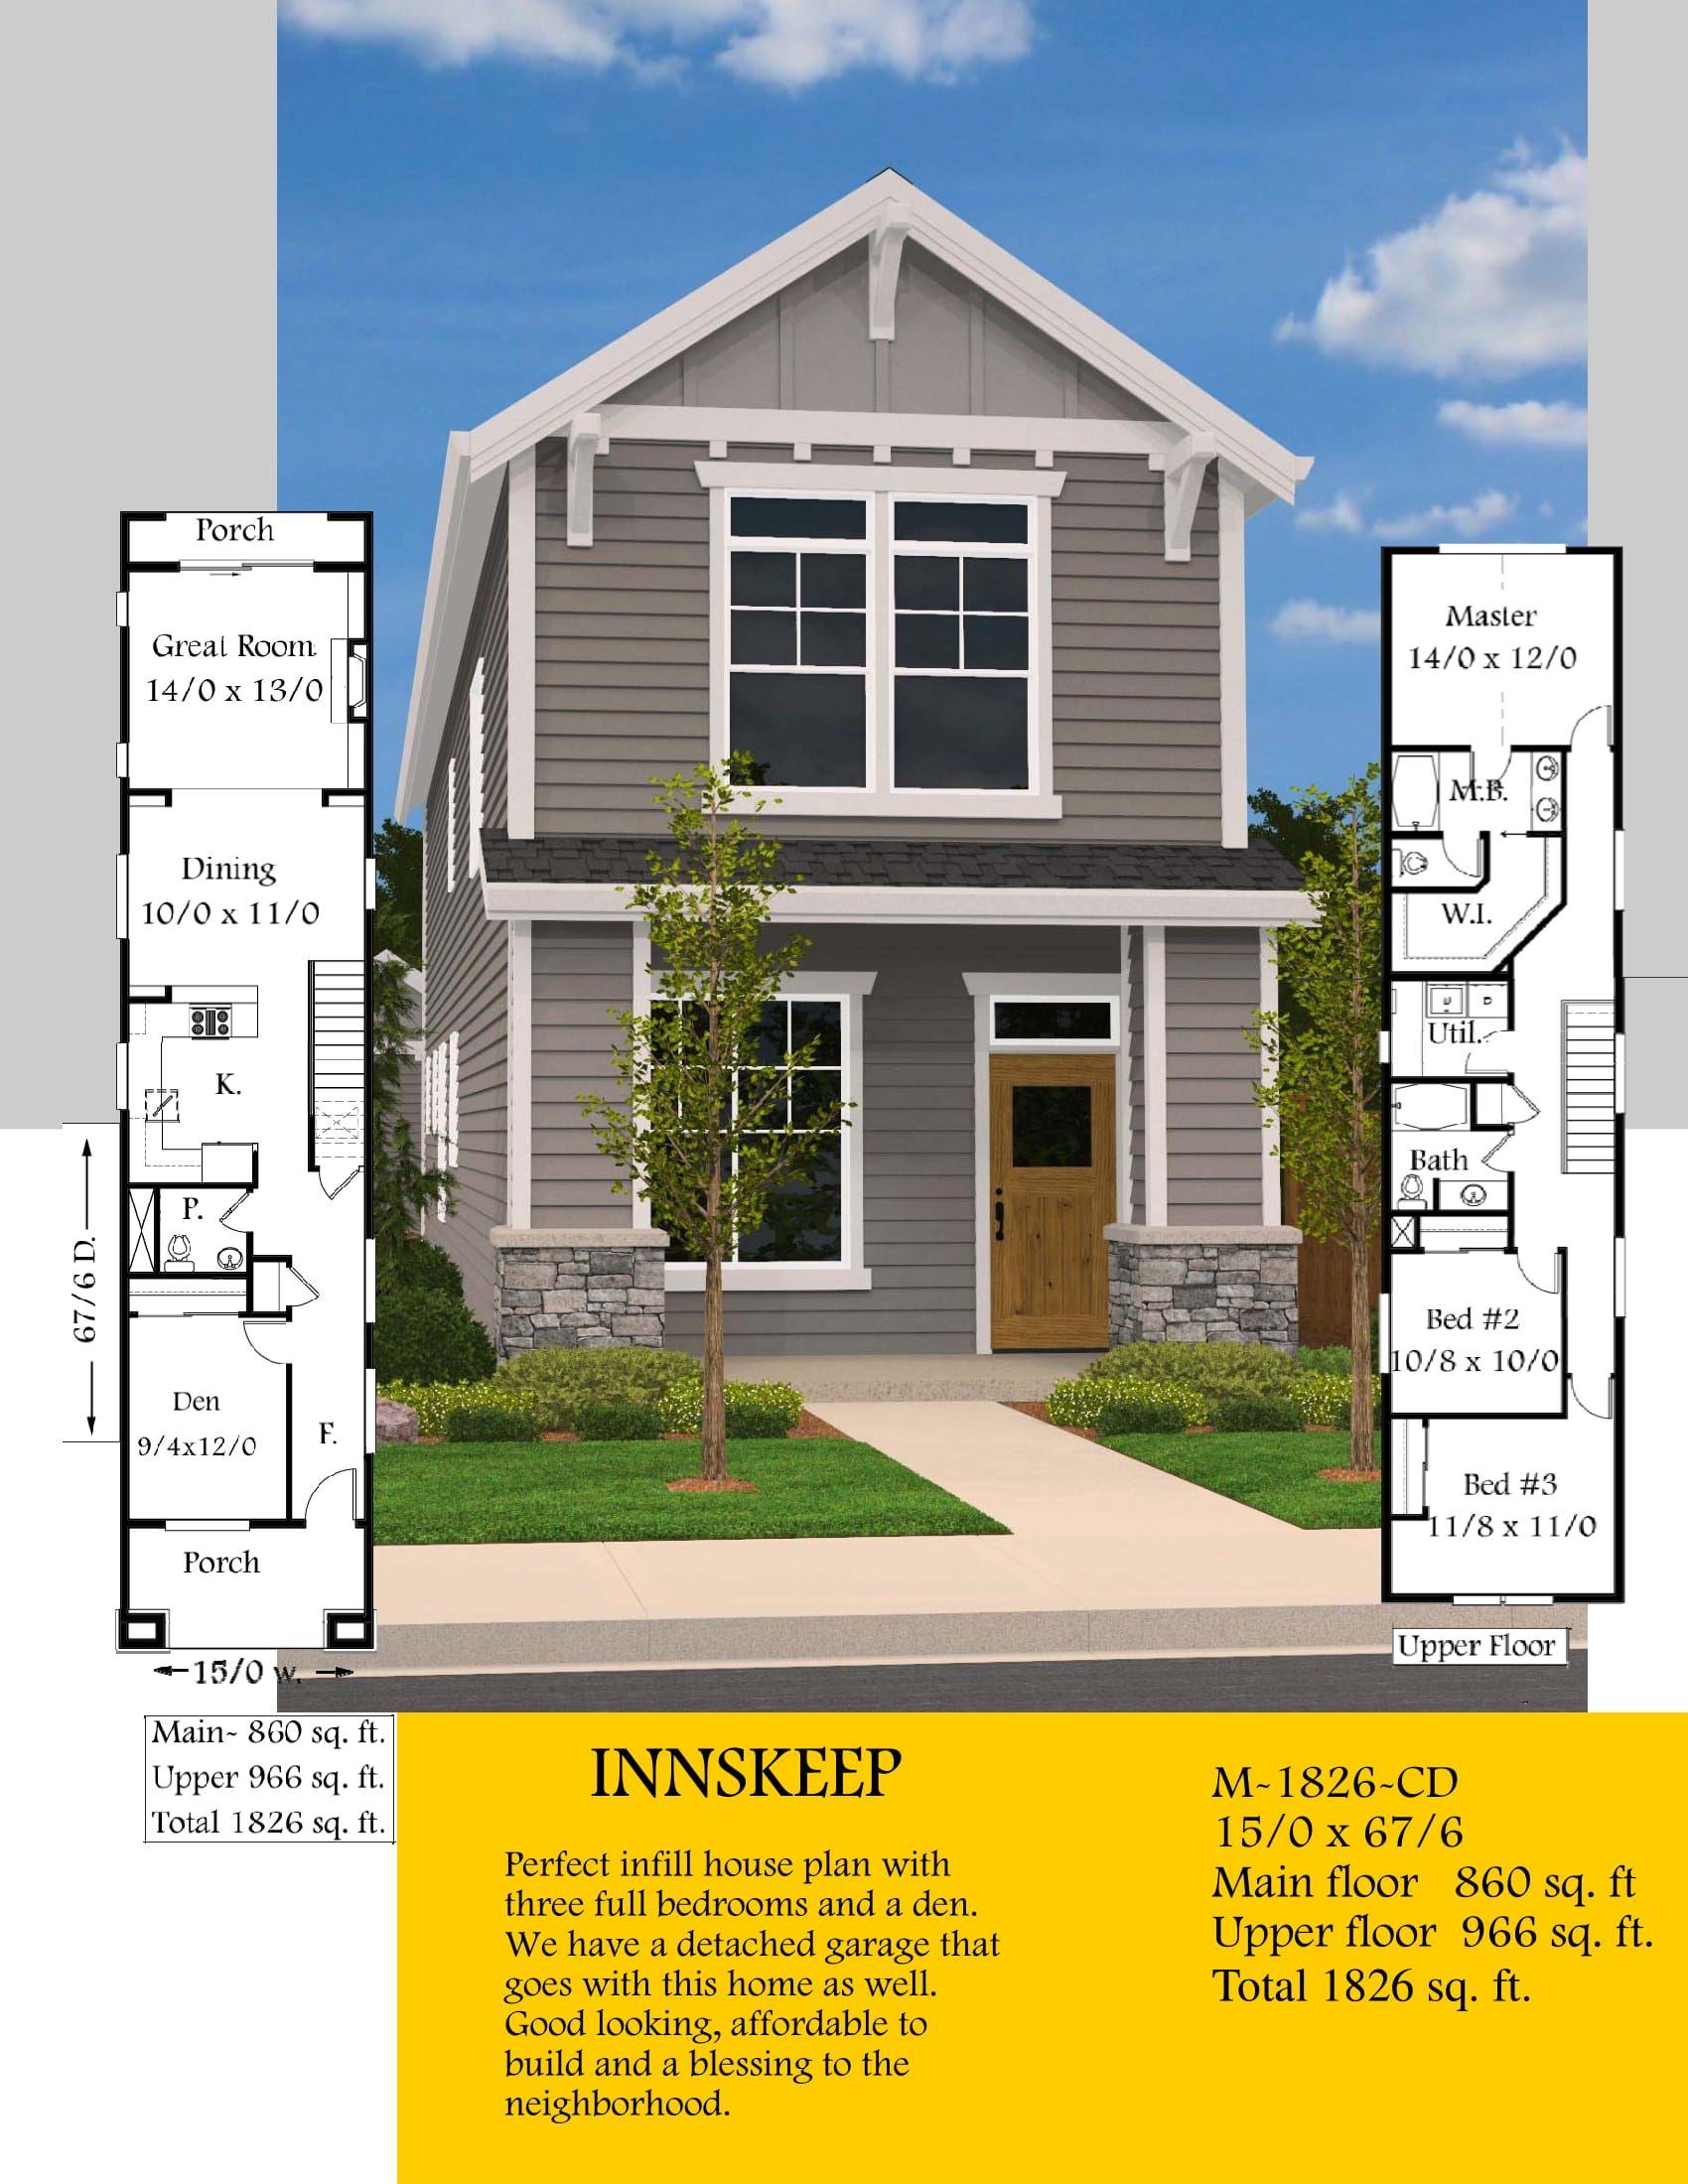 Innskeep Skinny House Plan By Mark Stewart Home Design House Plans Narrow Lot House Plans Modern House Plans